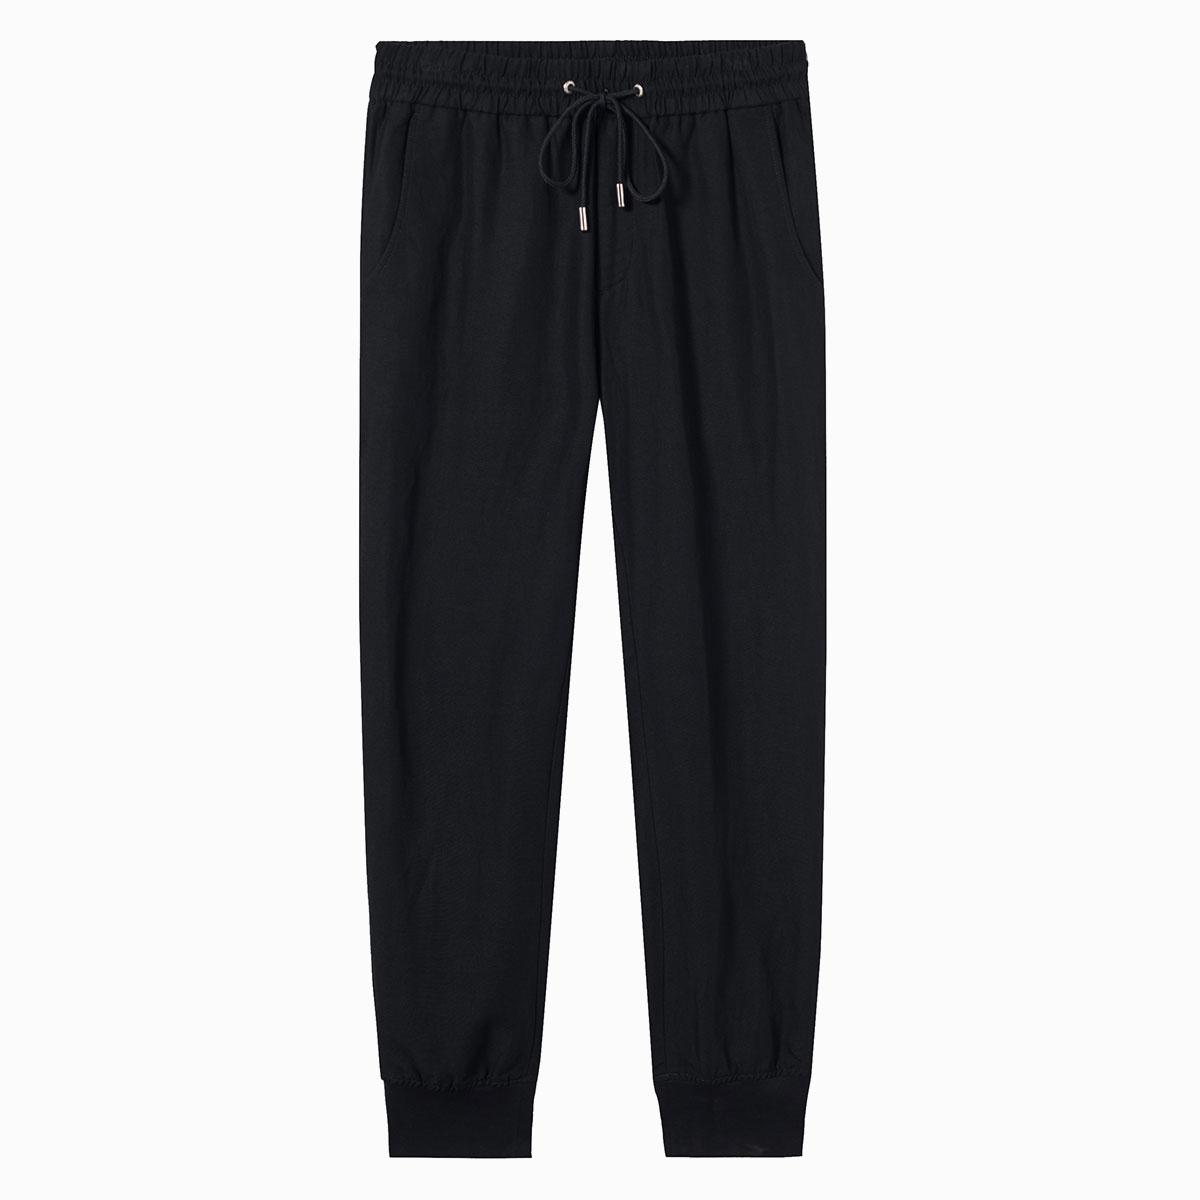 DEGAIADEGAIA 男士时尚休闲运动裤DGA-D161383601